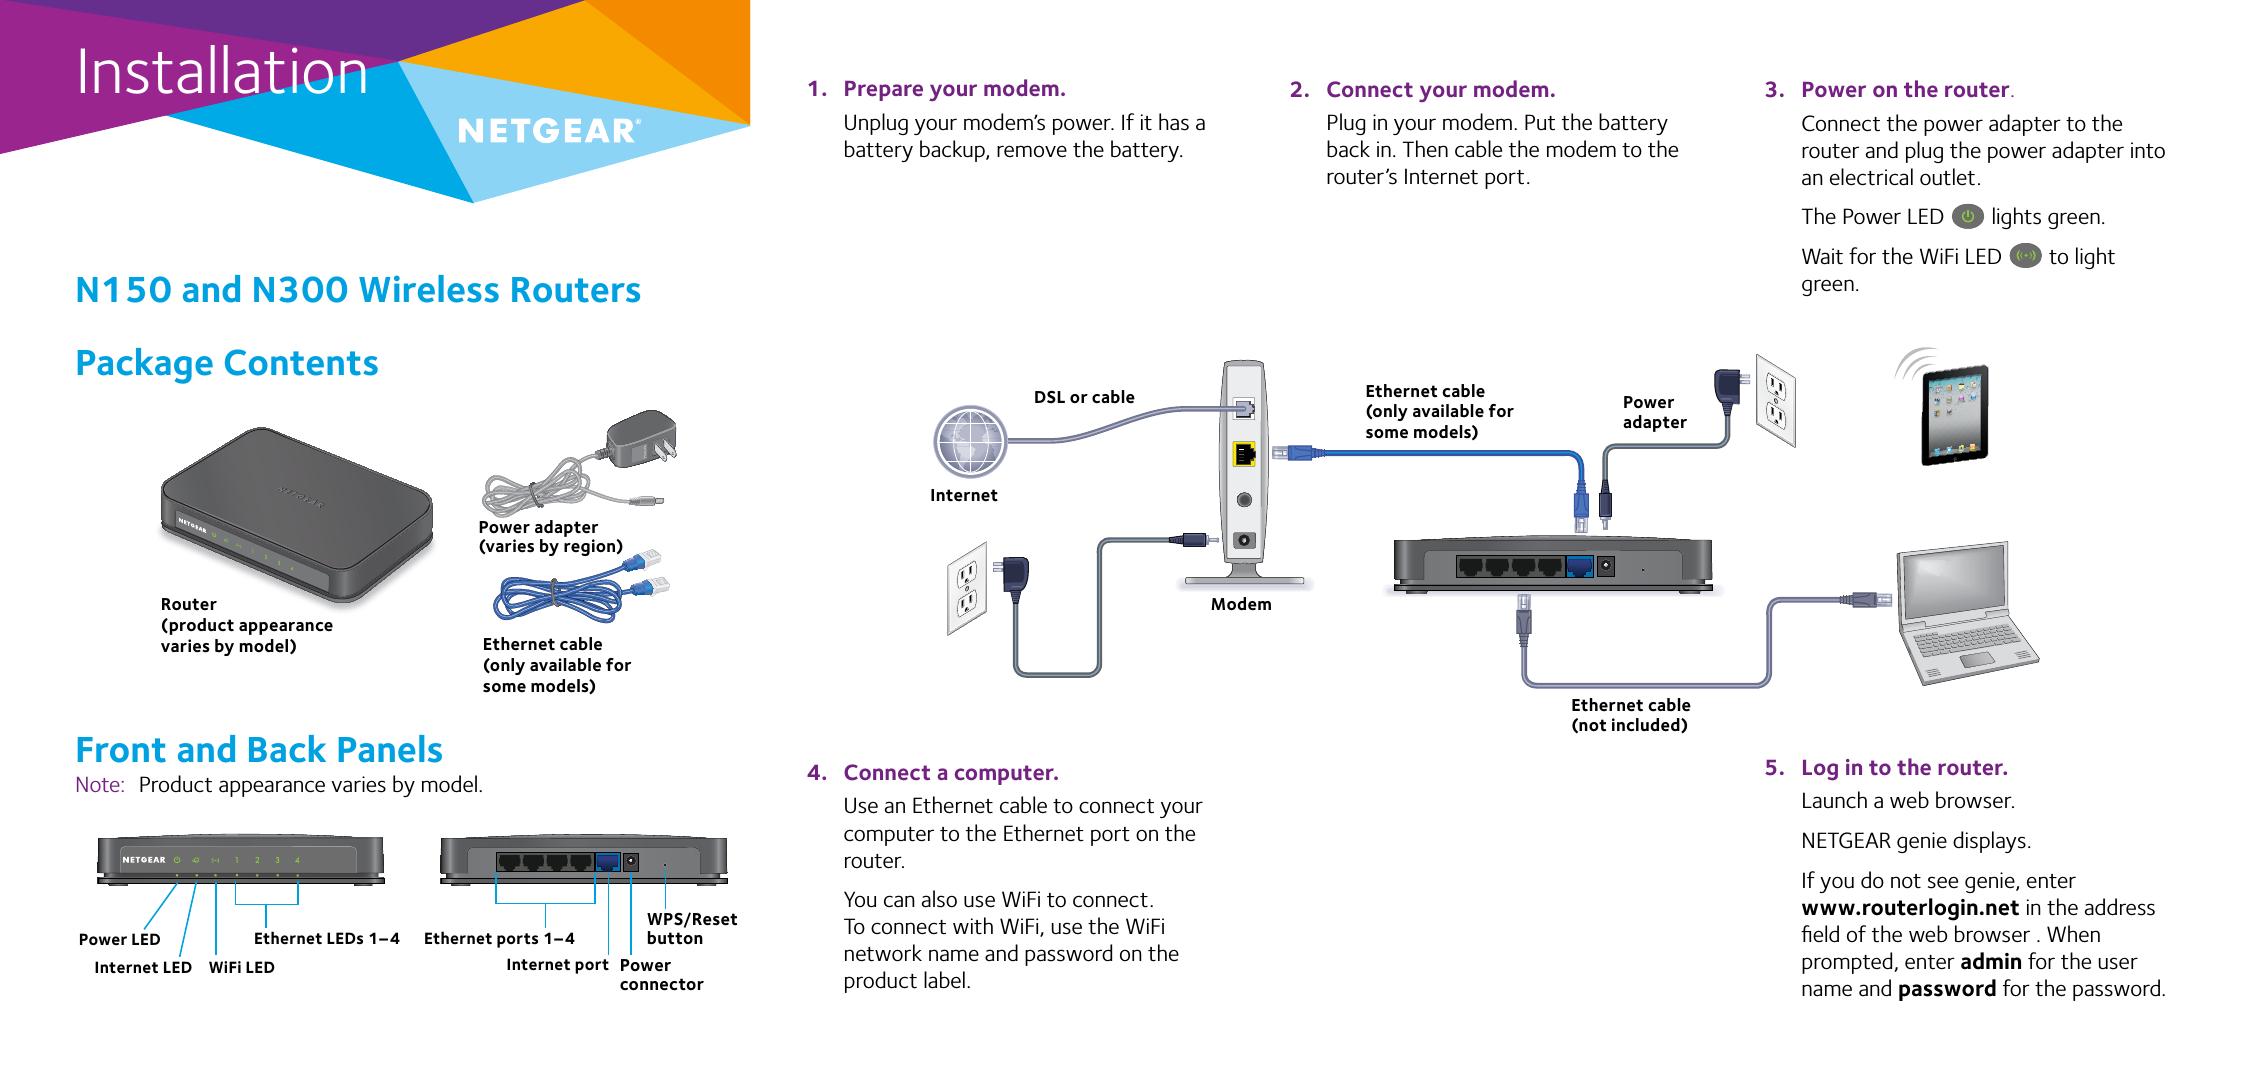 netgear n150 wireless modem router dgn1000 manual